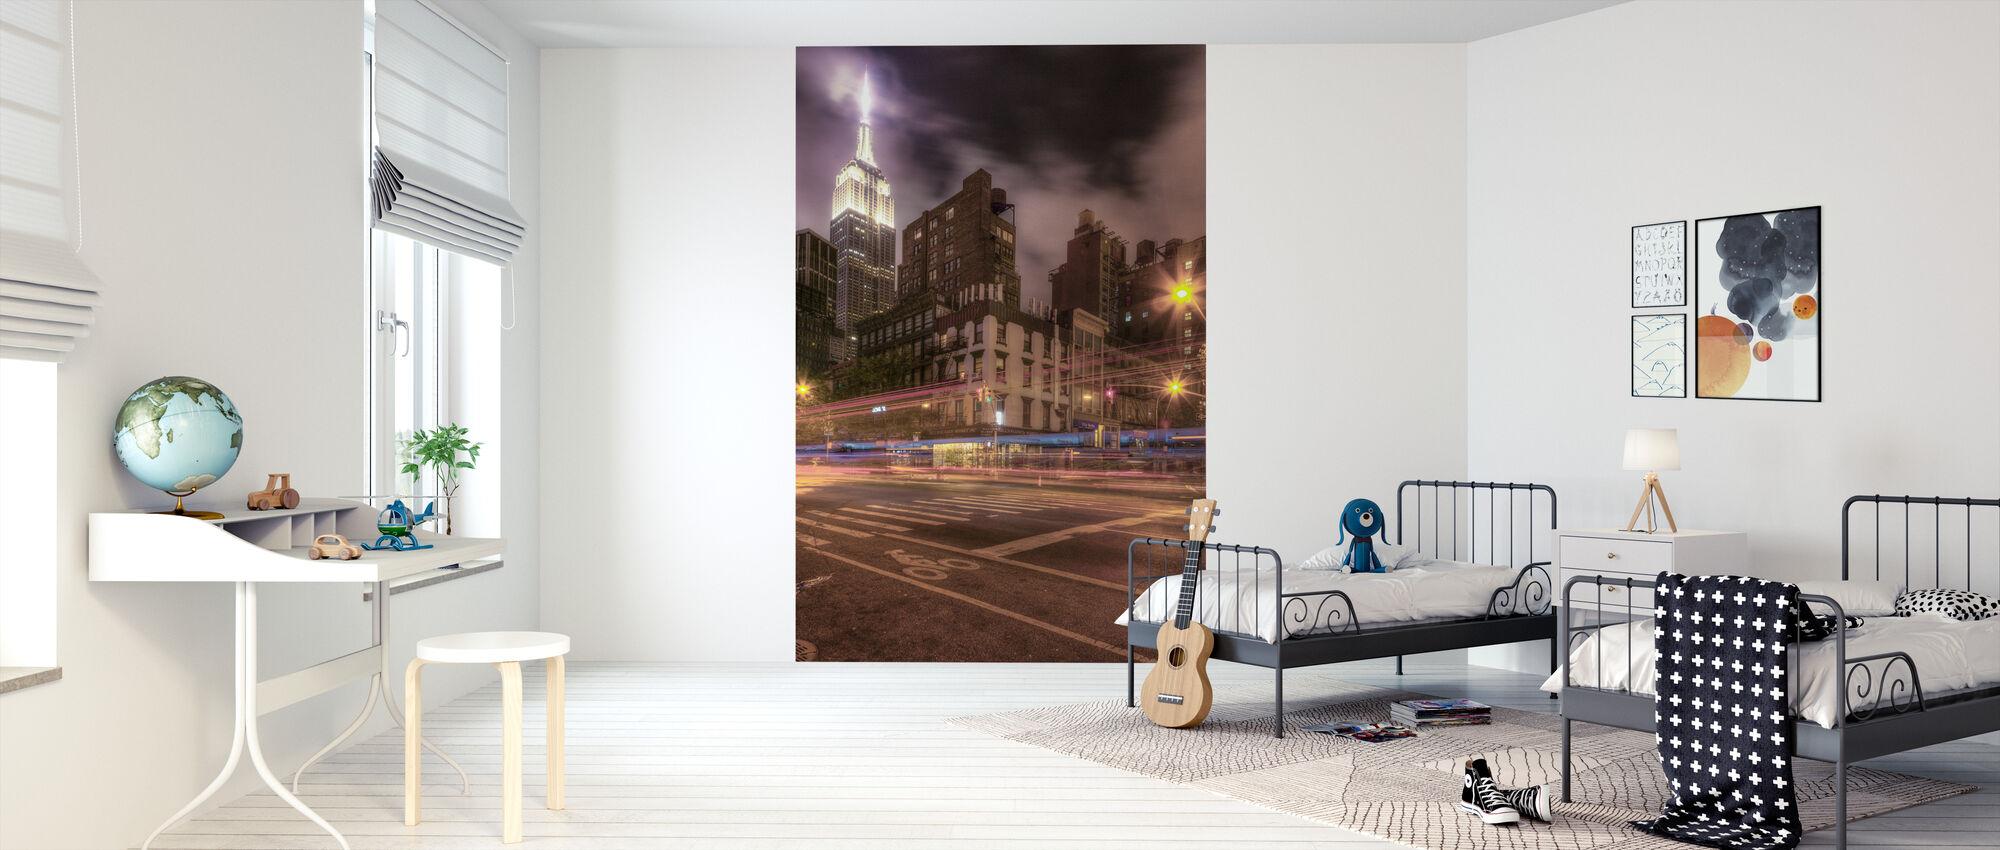 Gotham City - Wallpaper - Kids Room